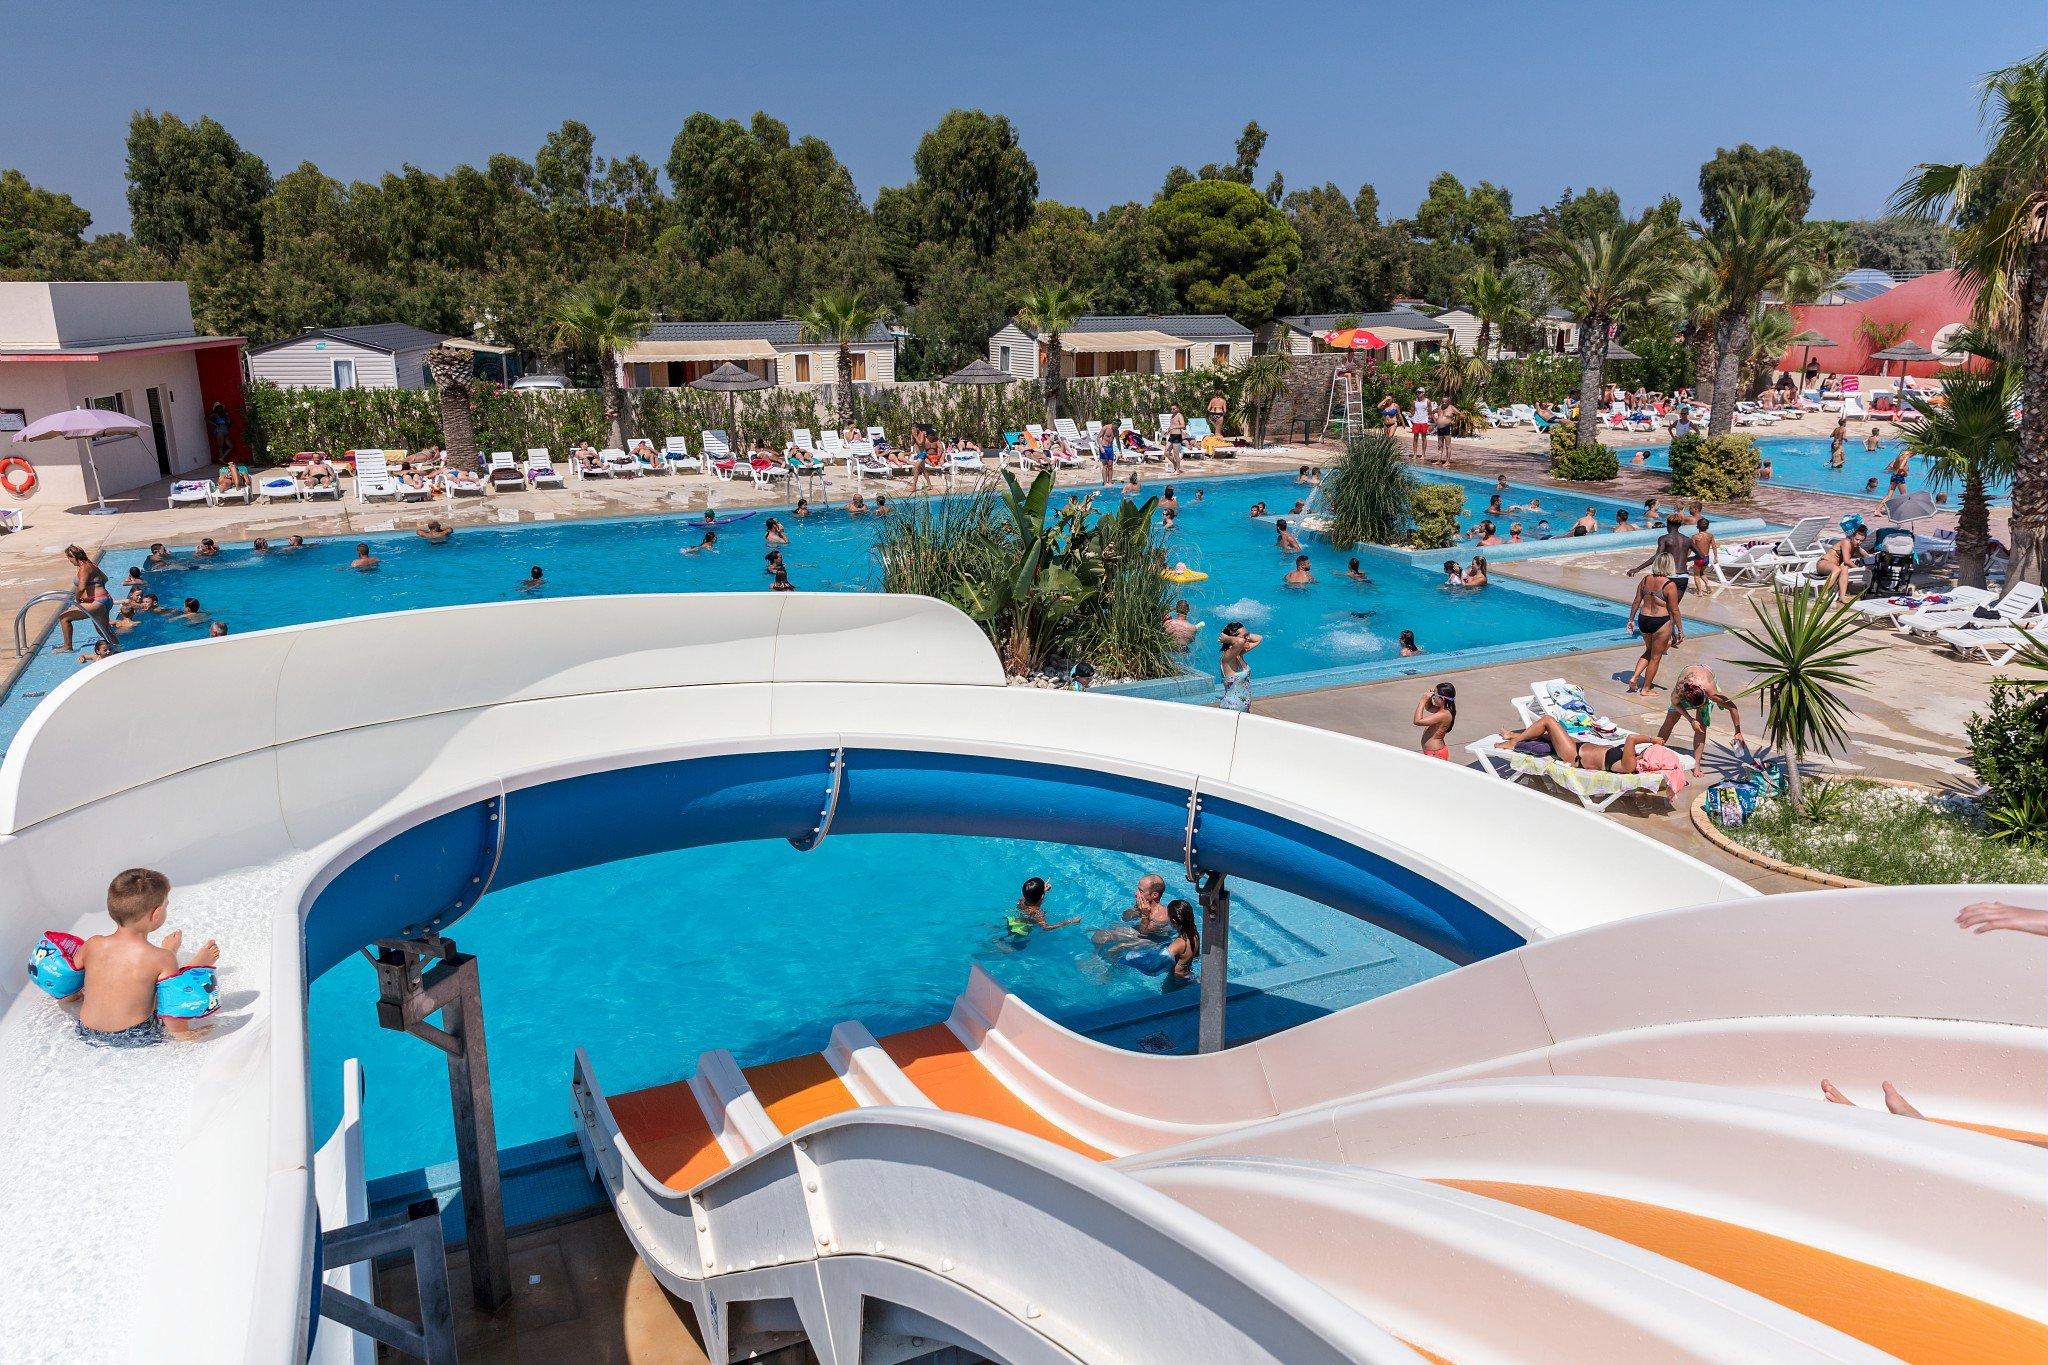 L'oasis & California **** avec Camping Bord De Mer Mediterranee Avec Piscine